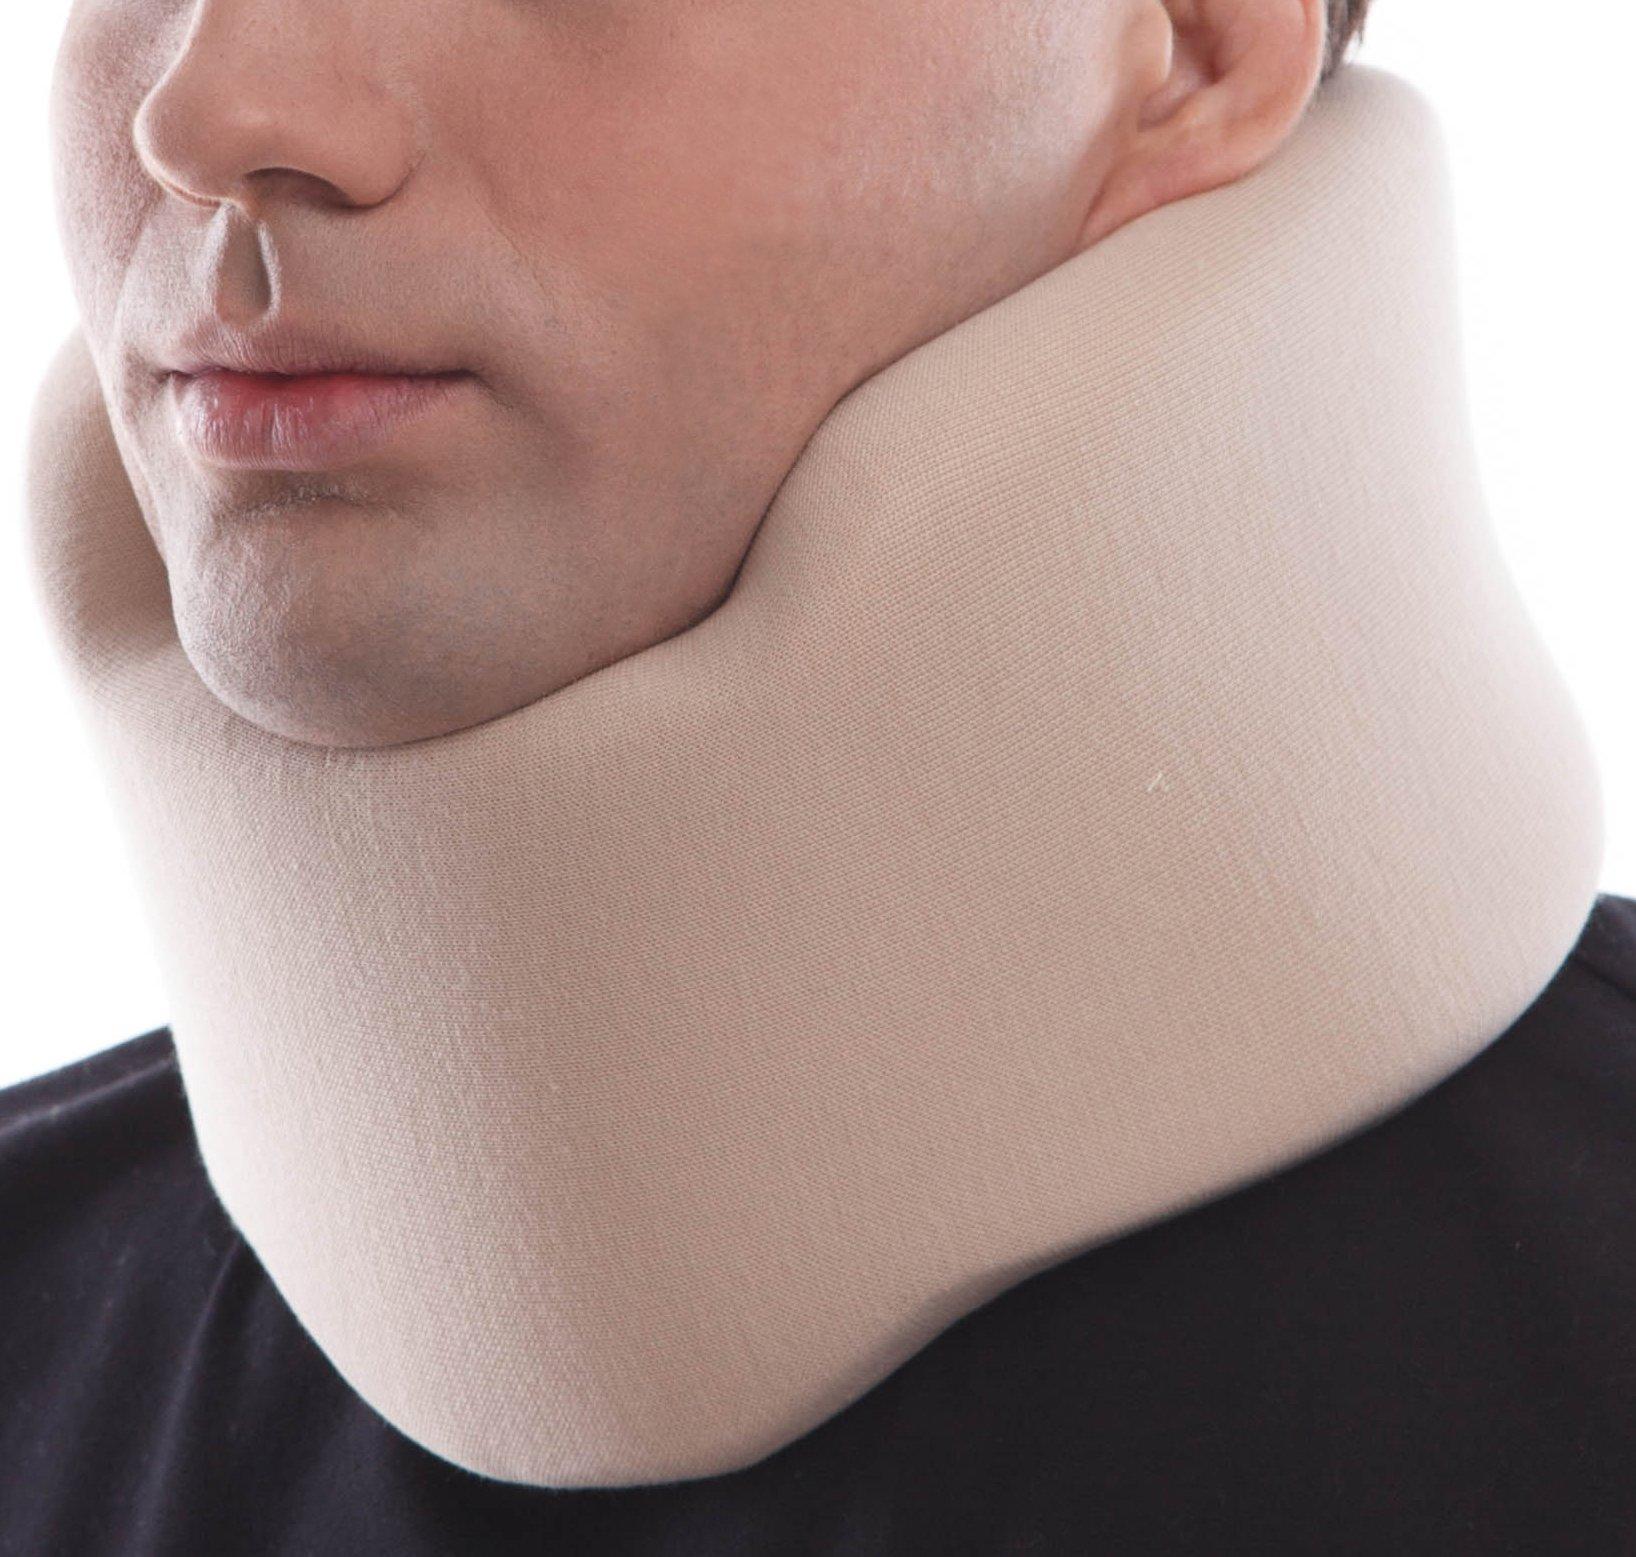 TOROS-GROUP Ergonomic Cervical Collar/Neck Support Brace / 100% - Cotton Liner - Neck 4½'' Beige